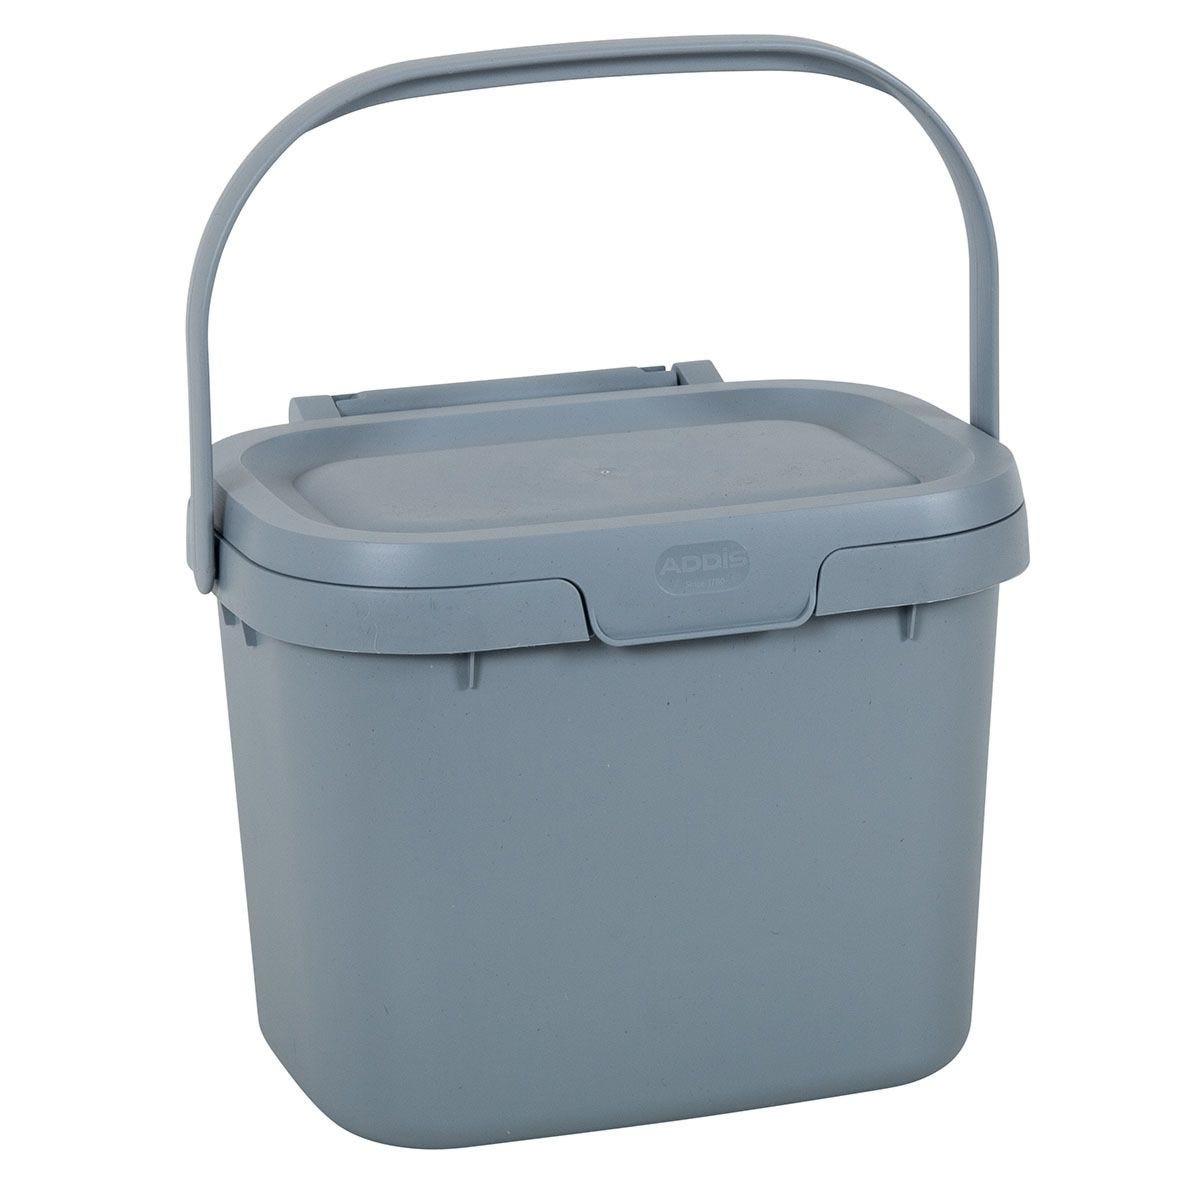 Addis Eco Compost Caddy - Grey